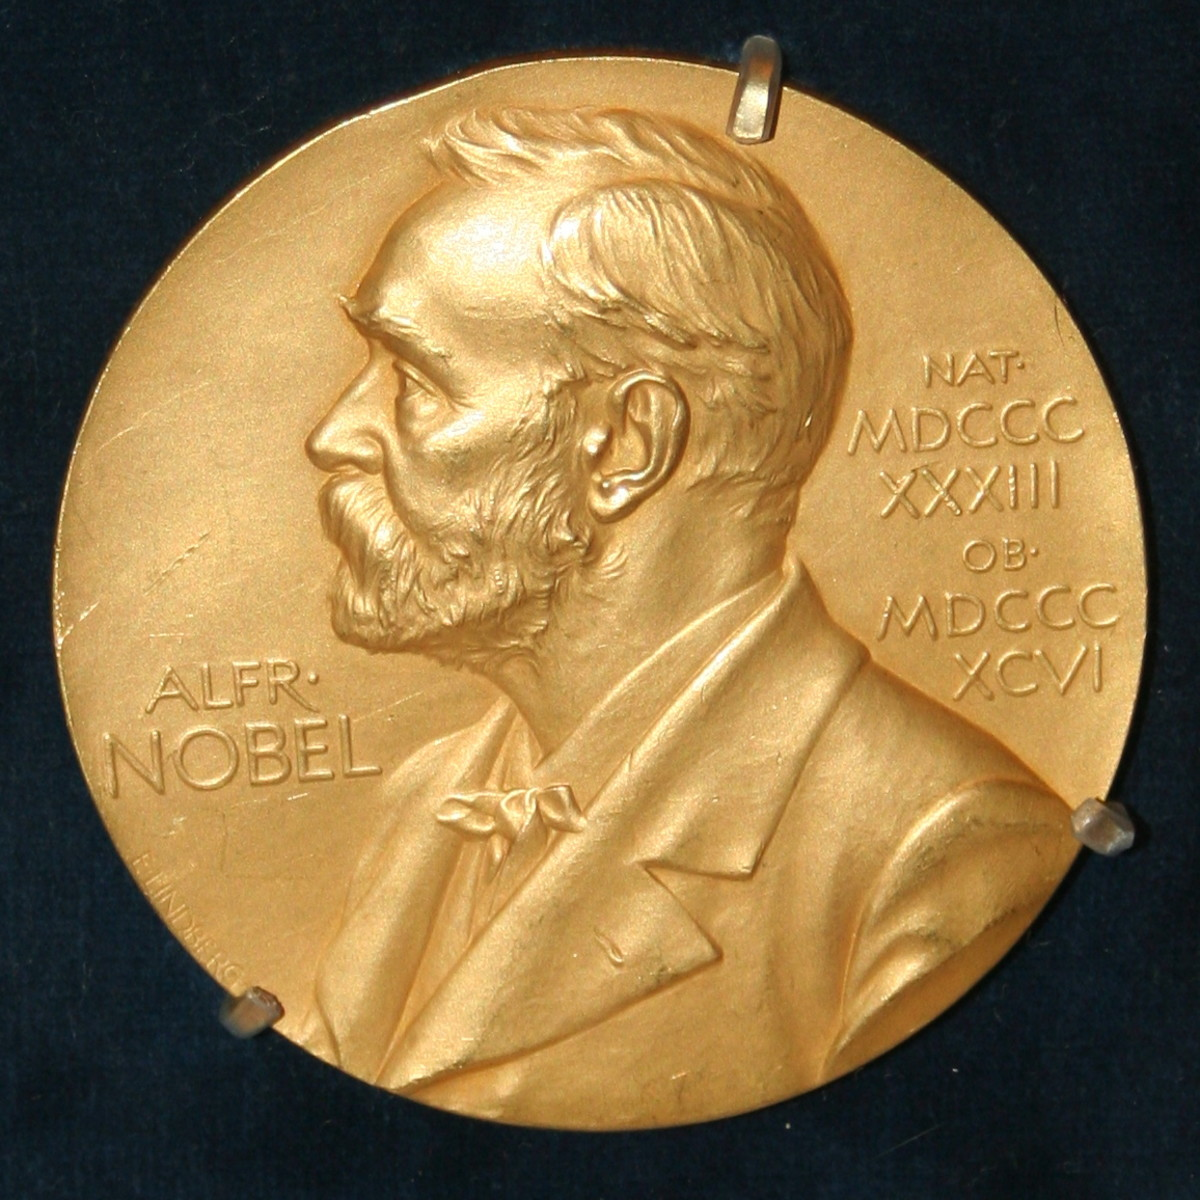 Nobel prize medal.